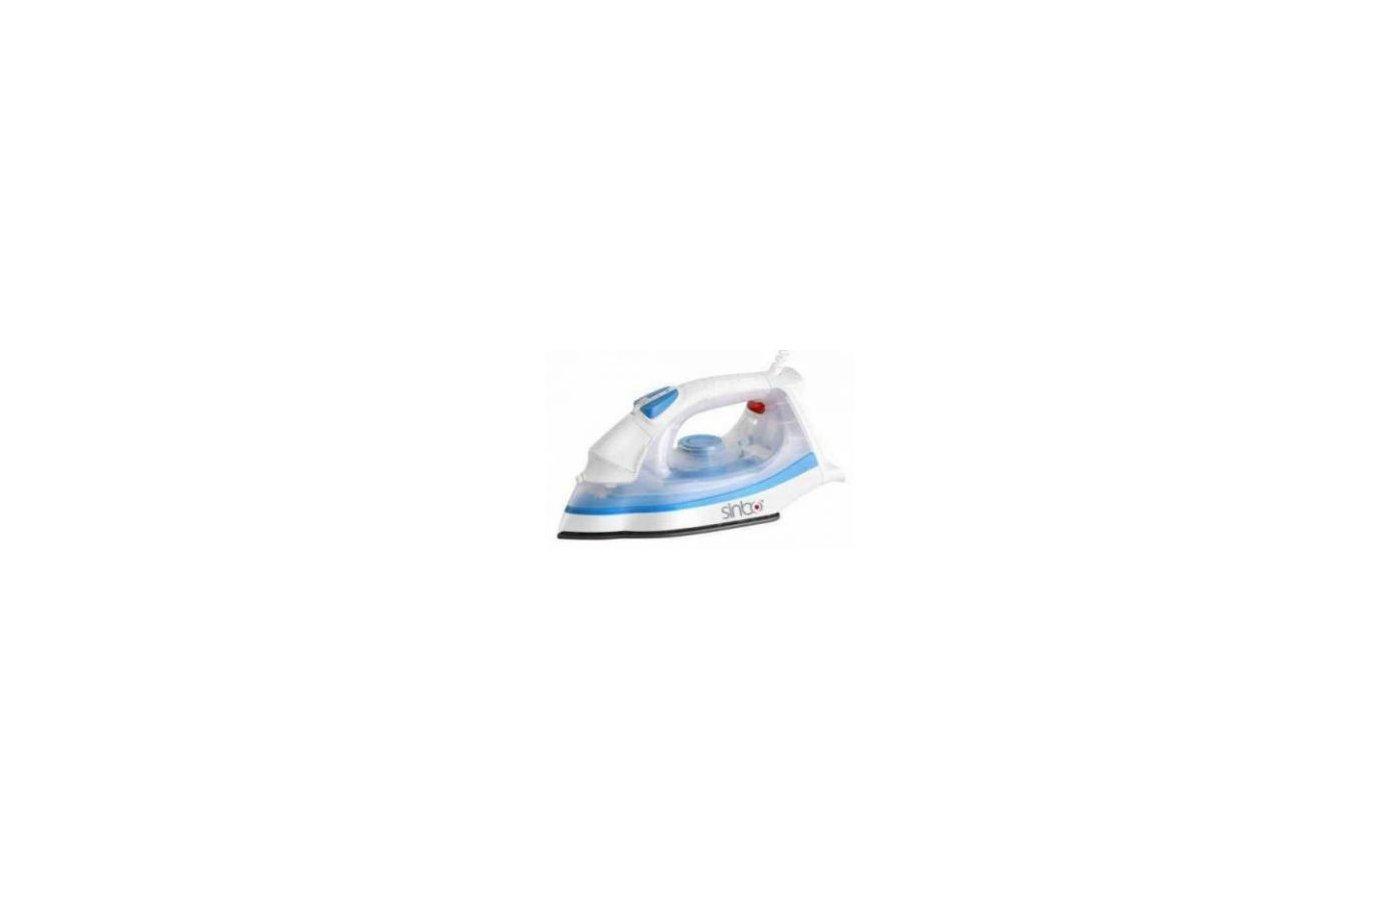 Утюг SINBO SSI 2882 белый/голубой